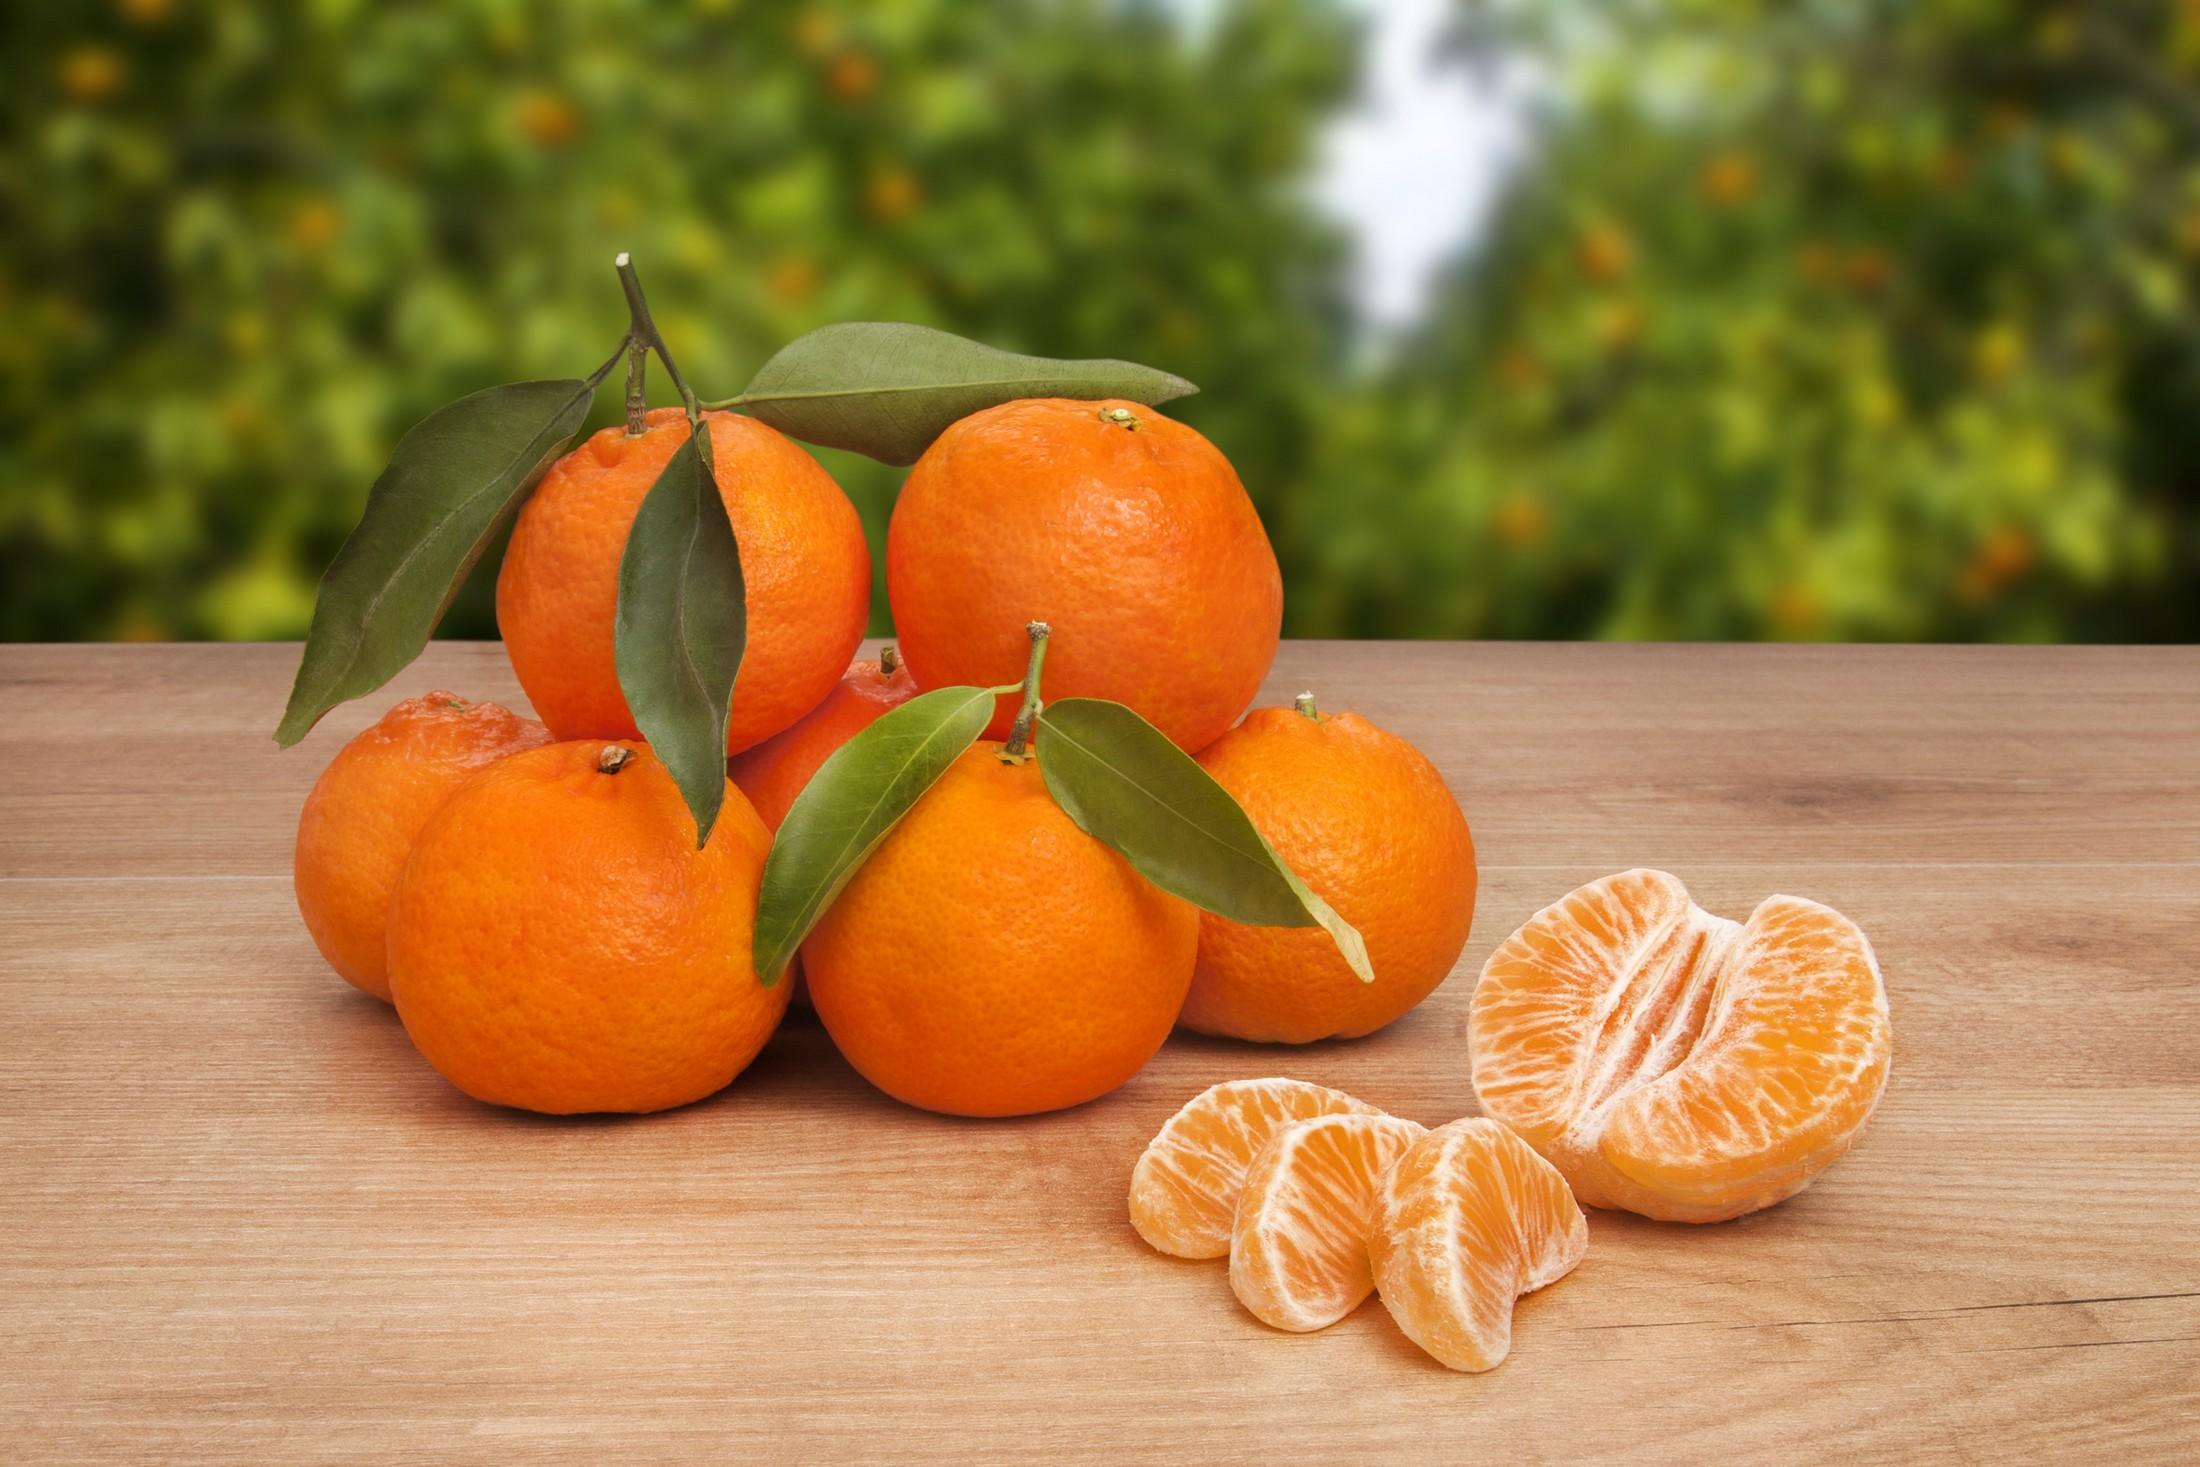 Mandarinas Clemenules - naranjaslaviejaalqueria.com